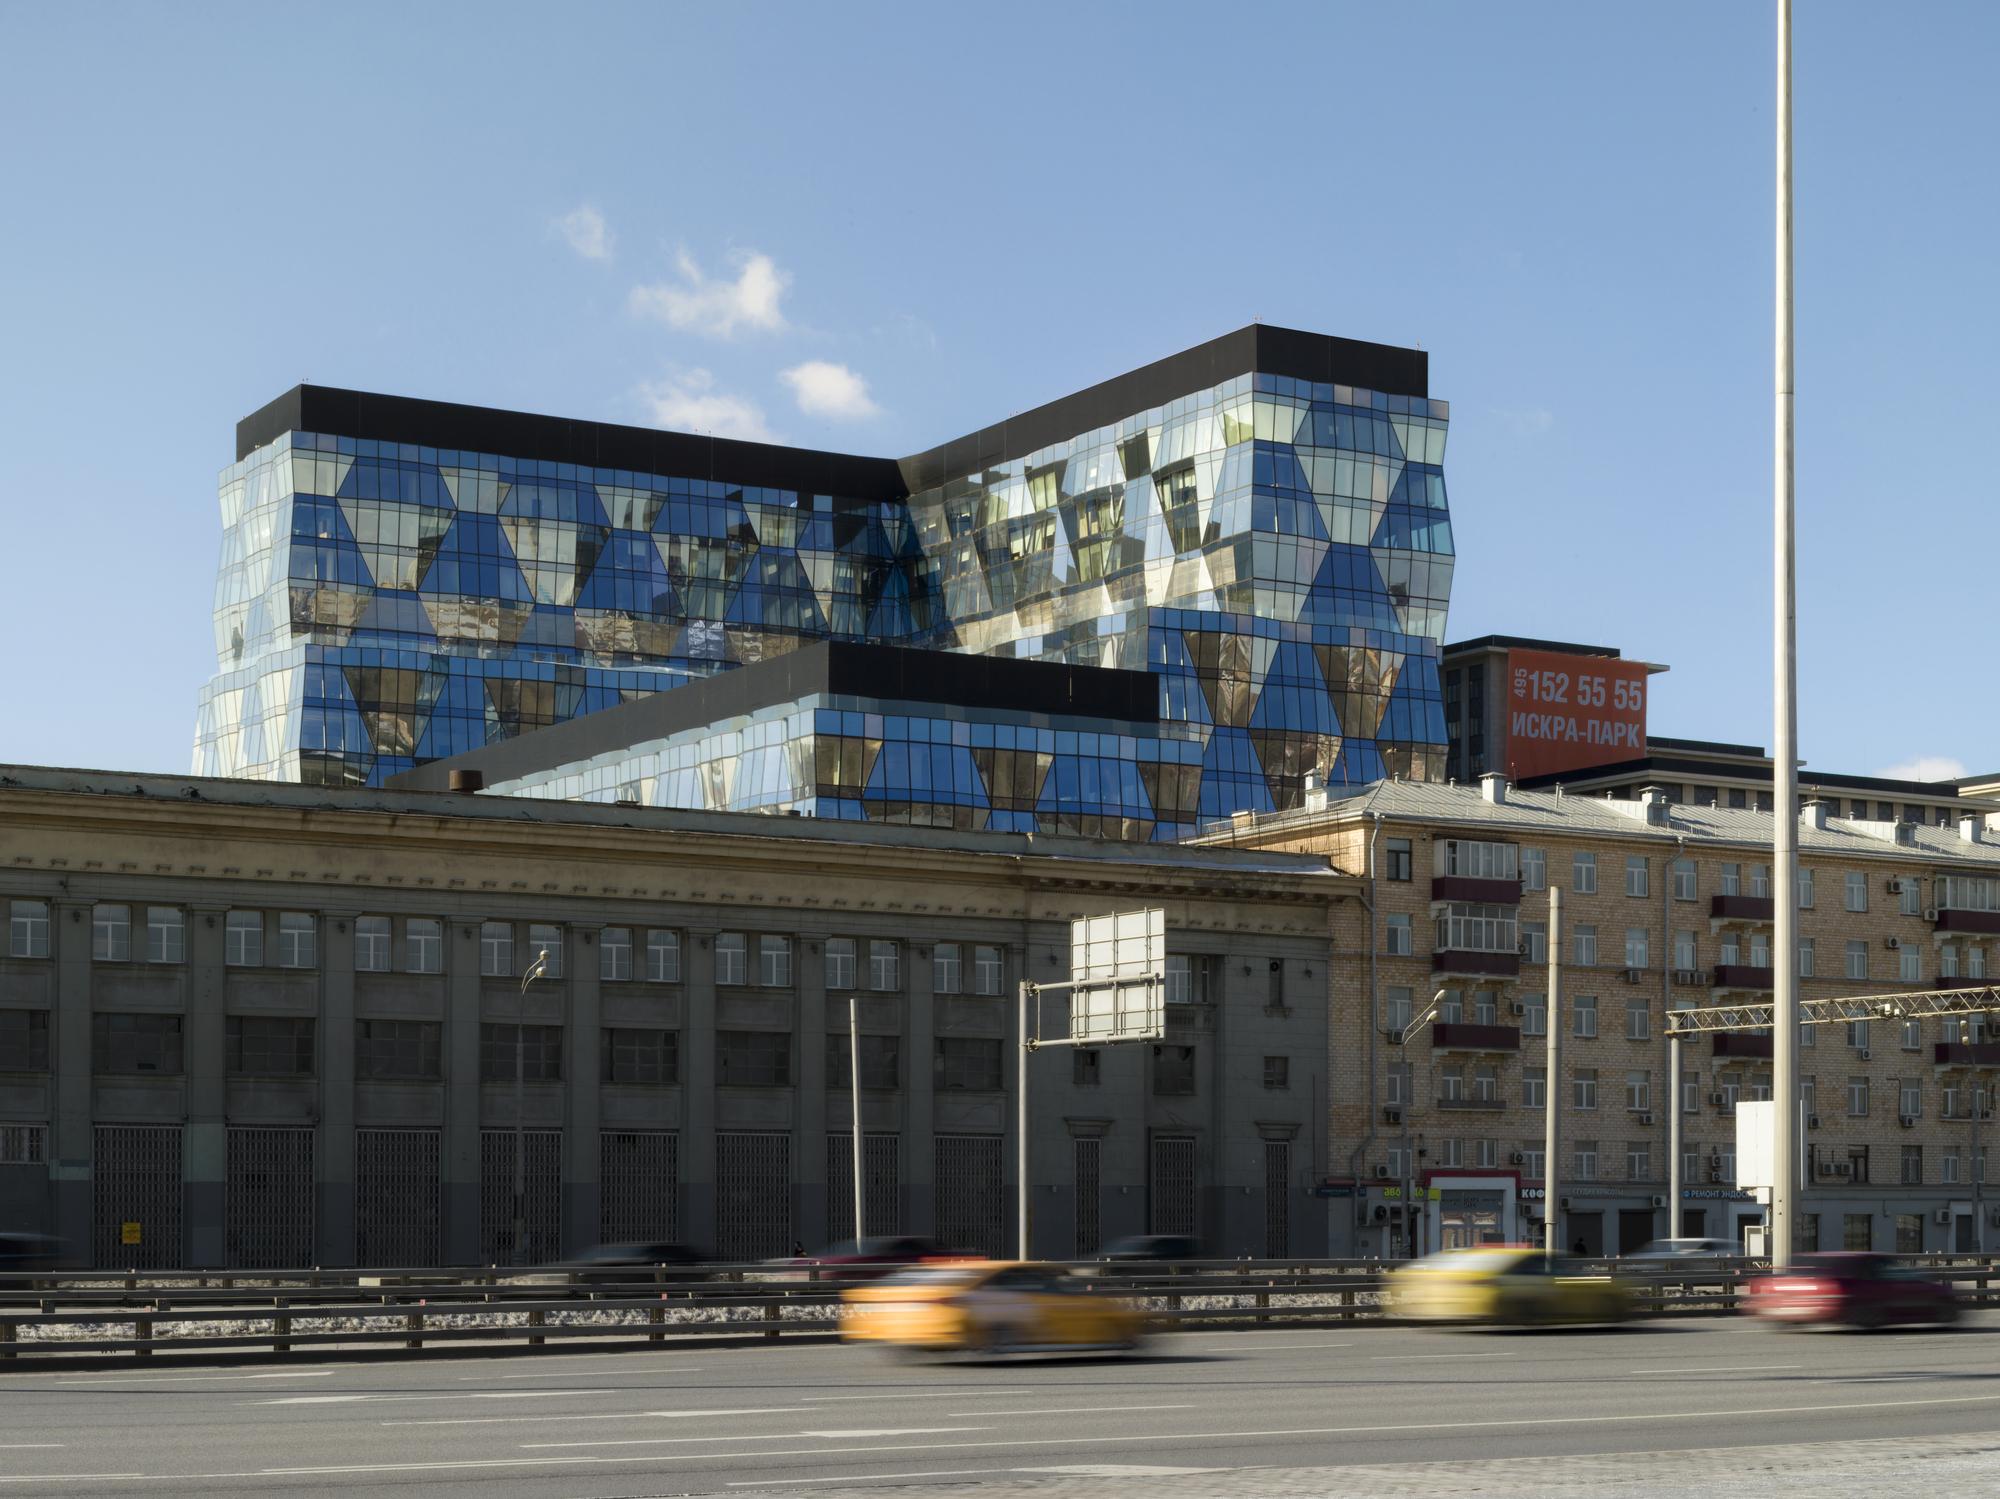 Iskra Park Office Building / SPEECH